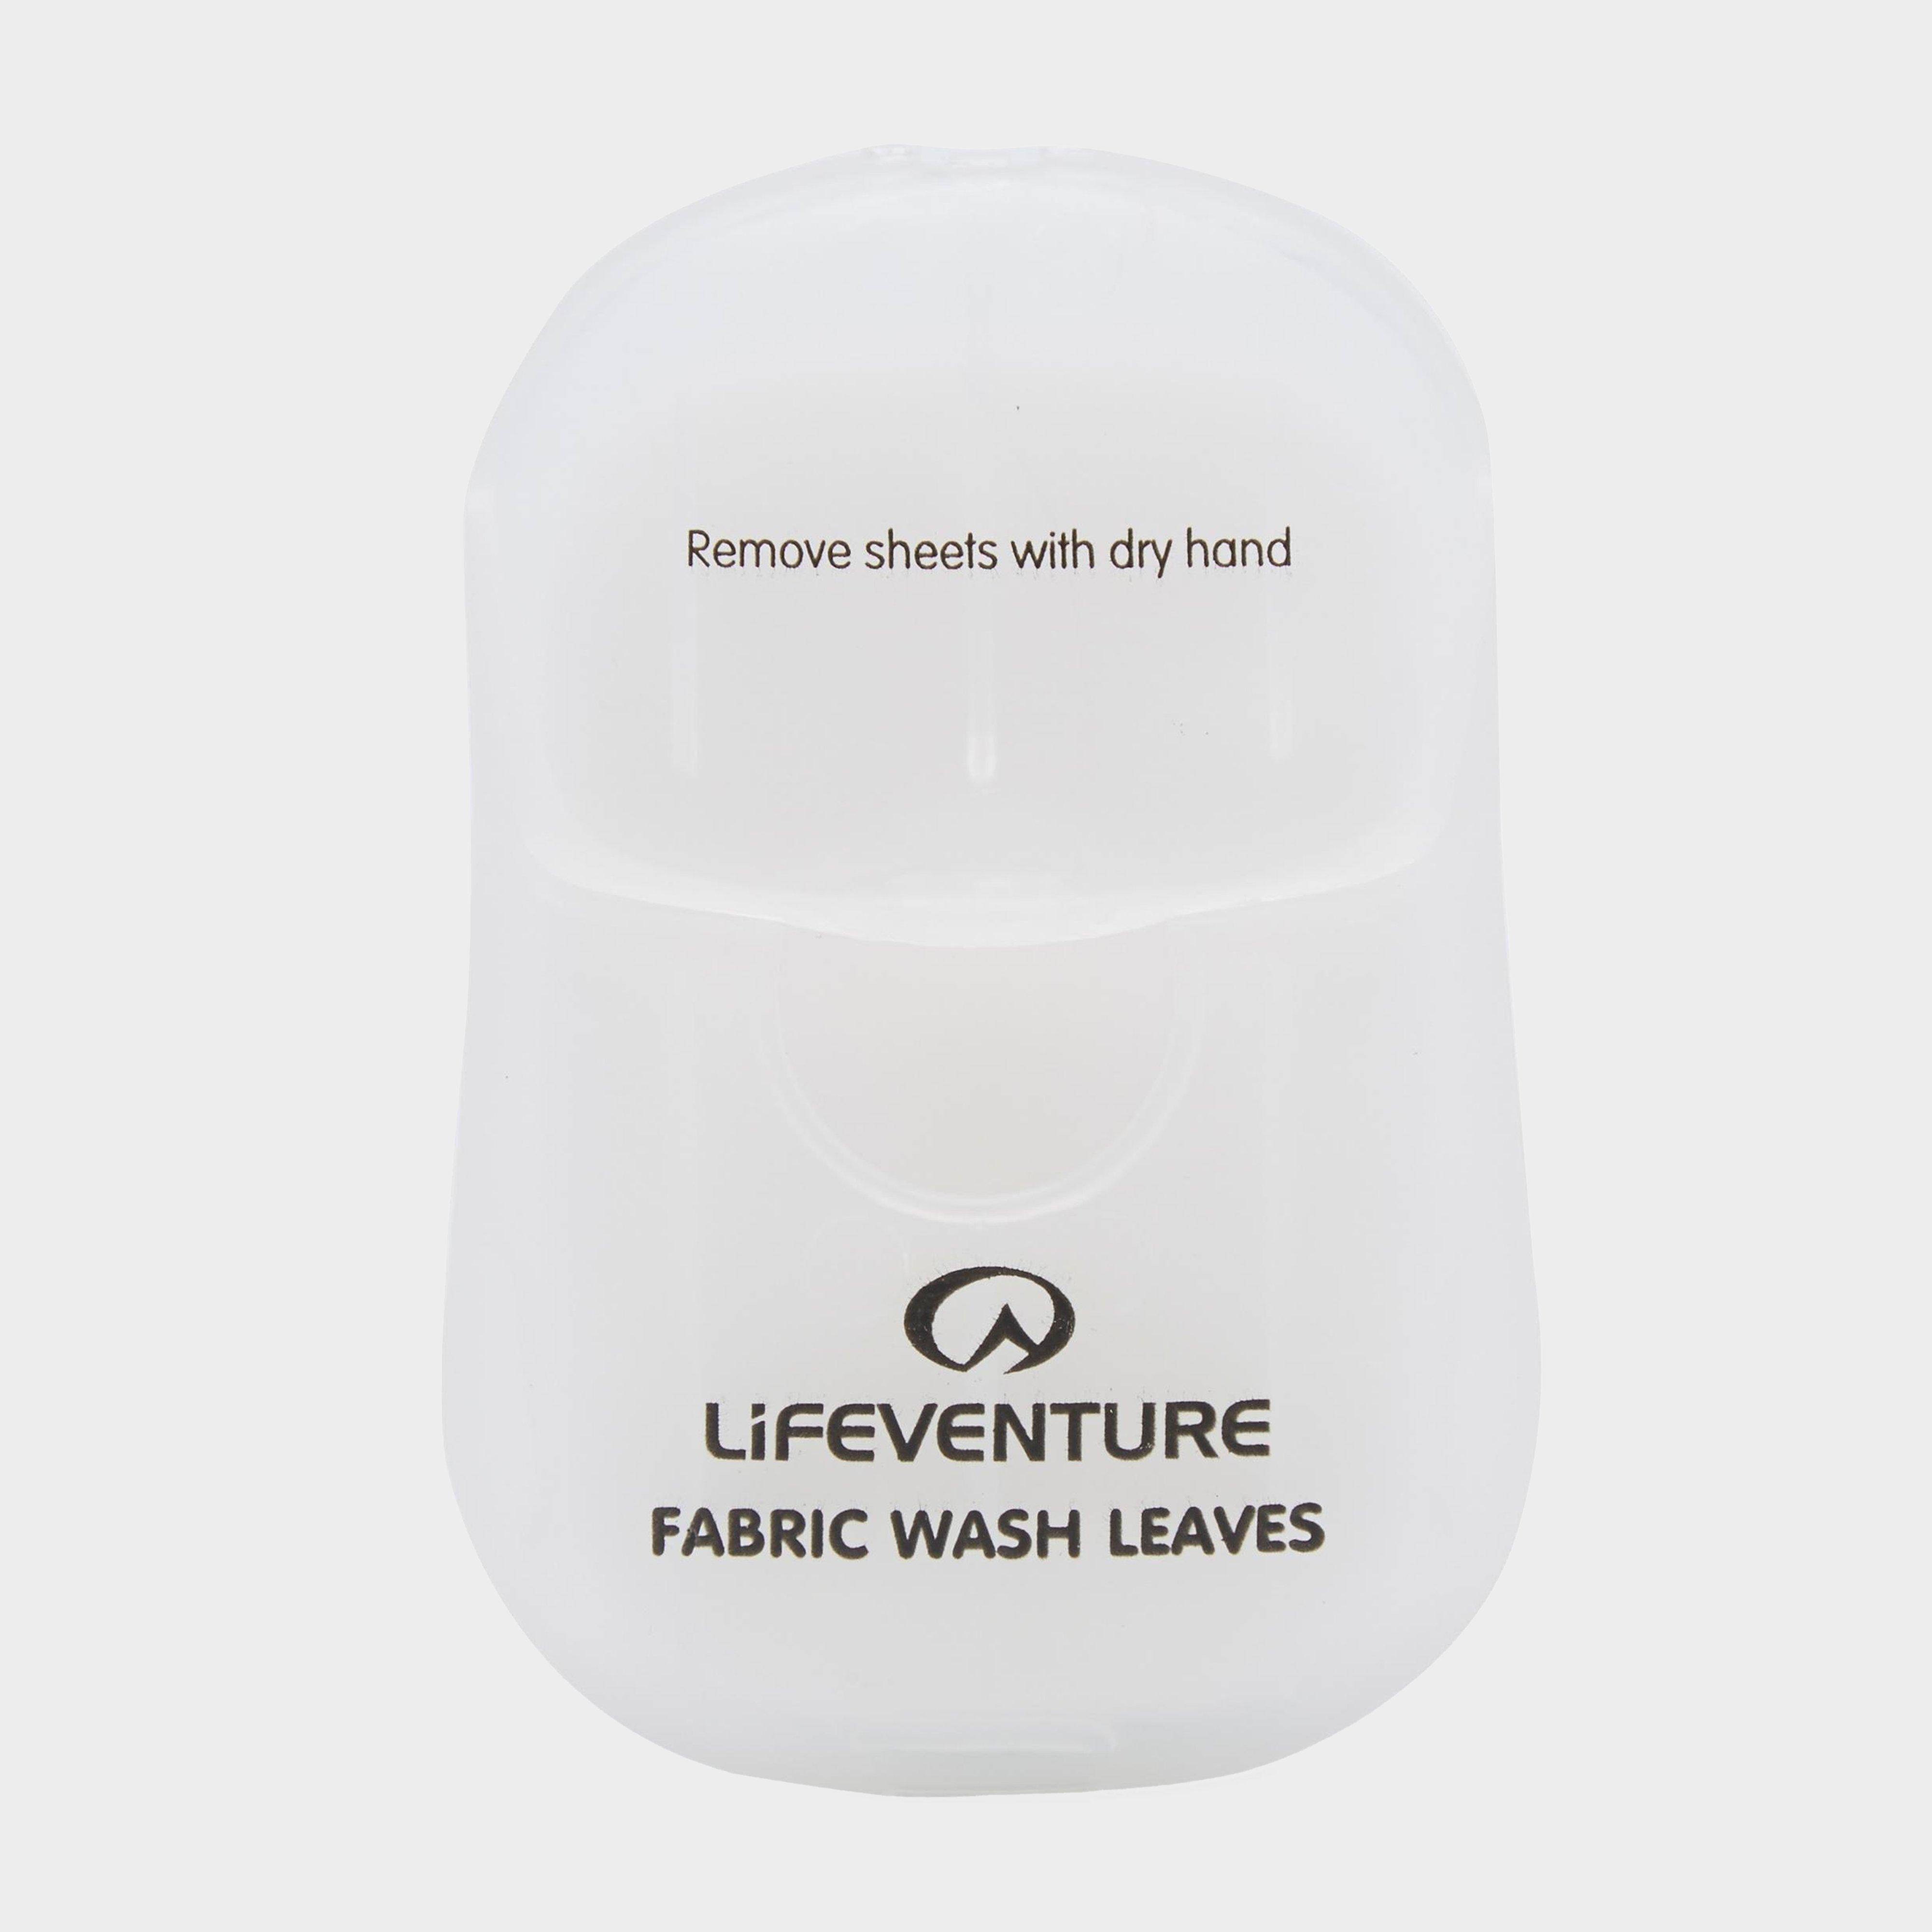 Lifeventure Lifeventure Fabric Wash Leaves - White, White